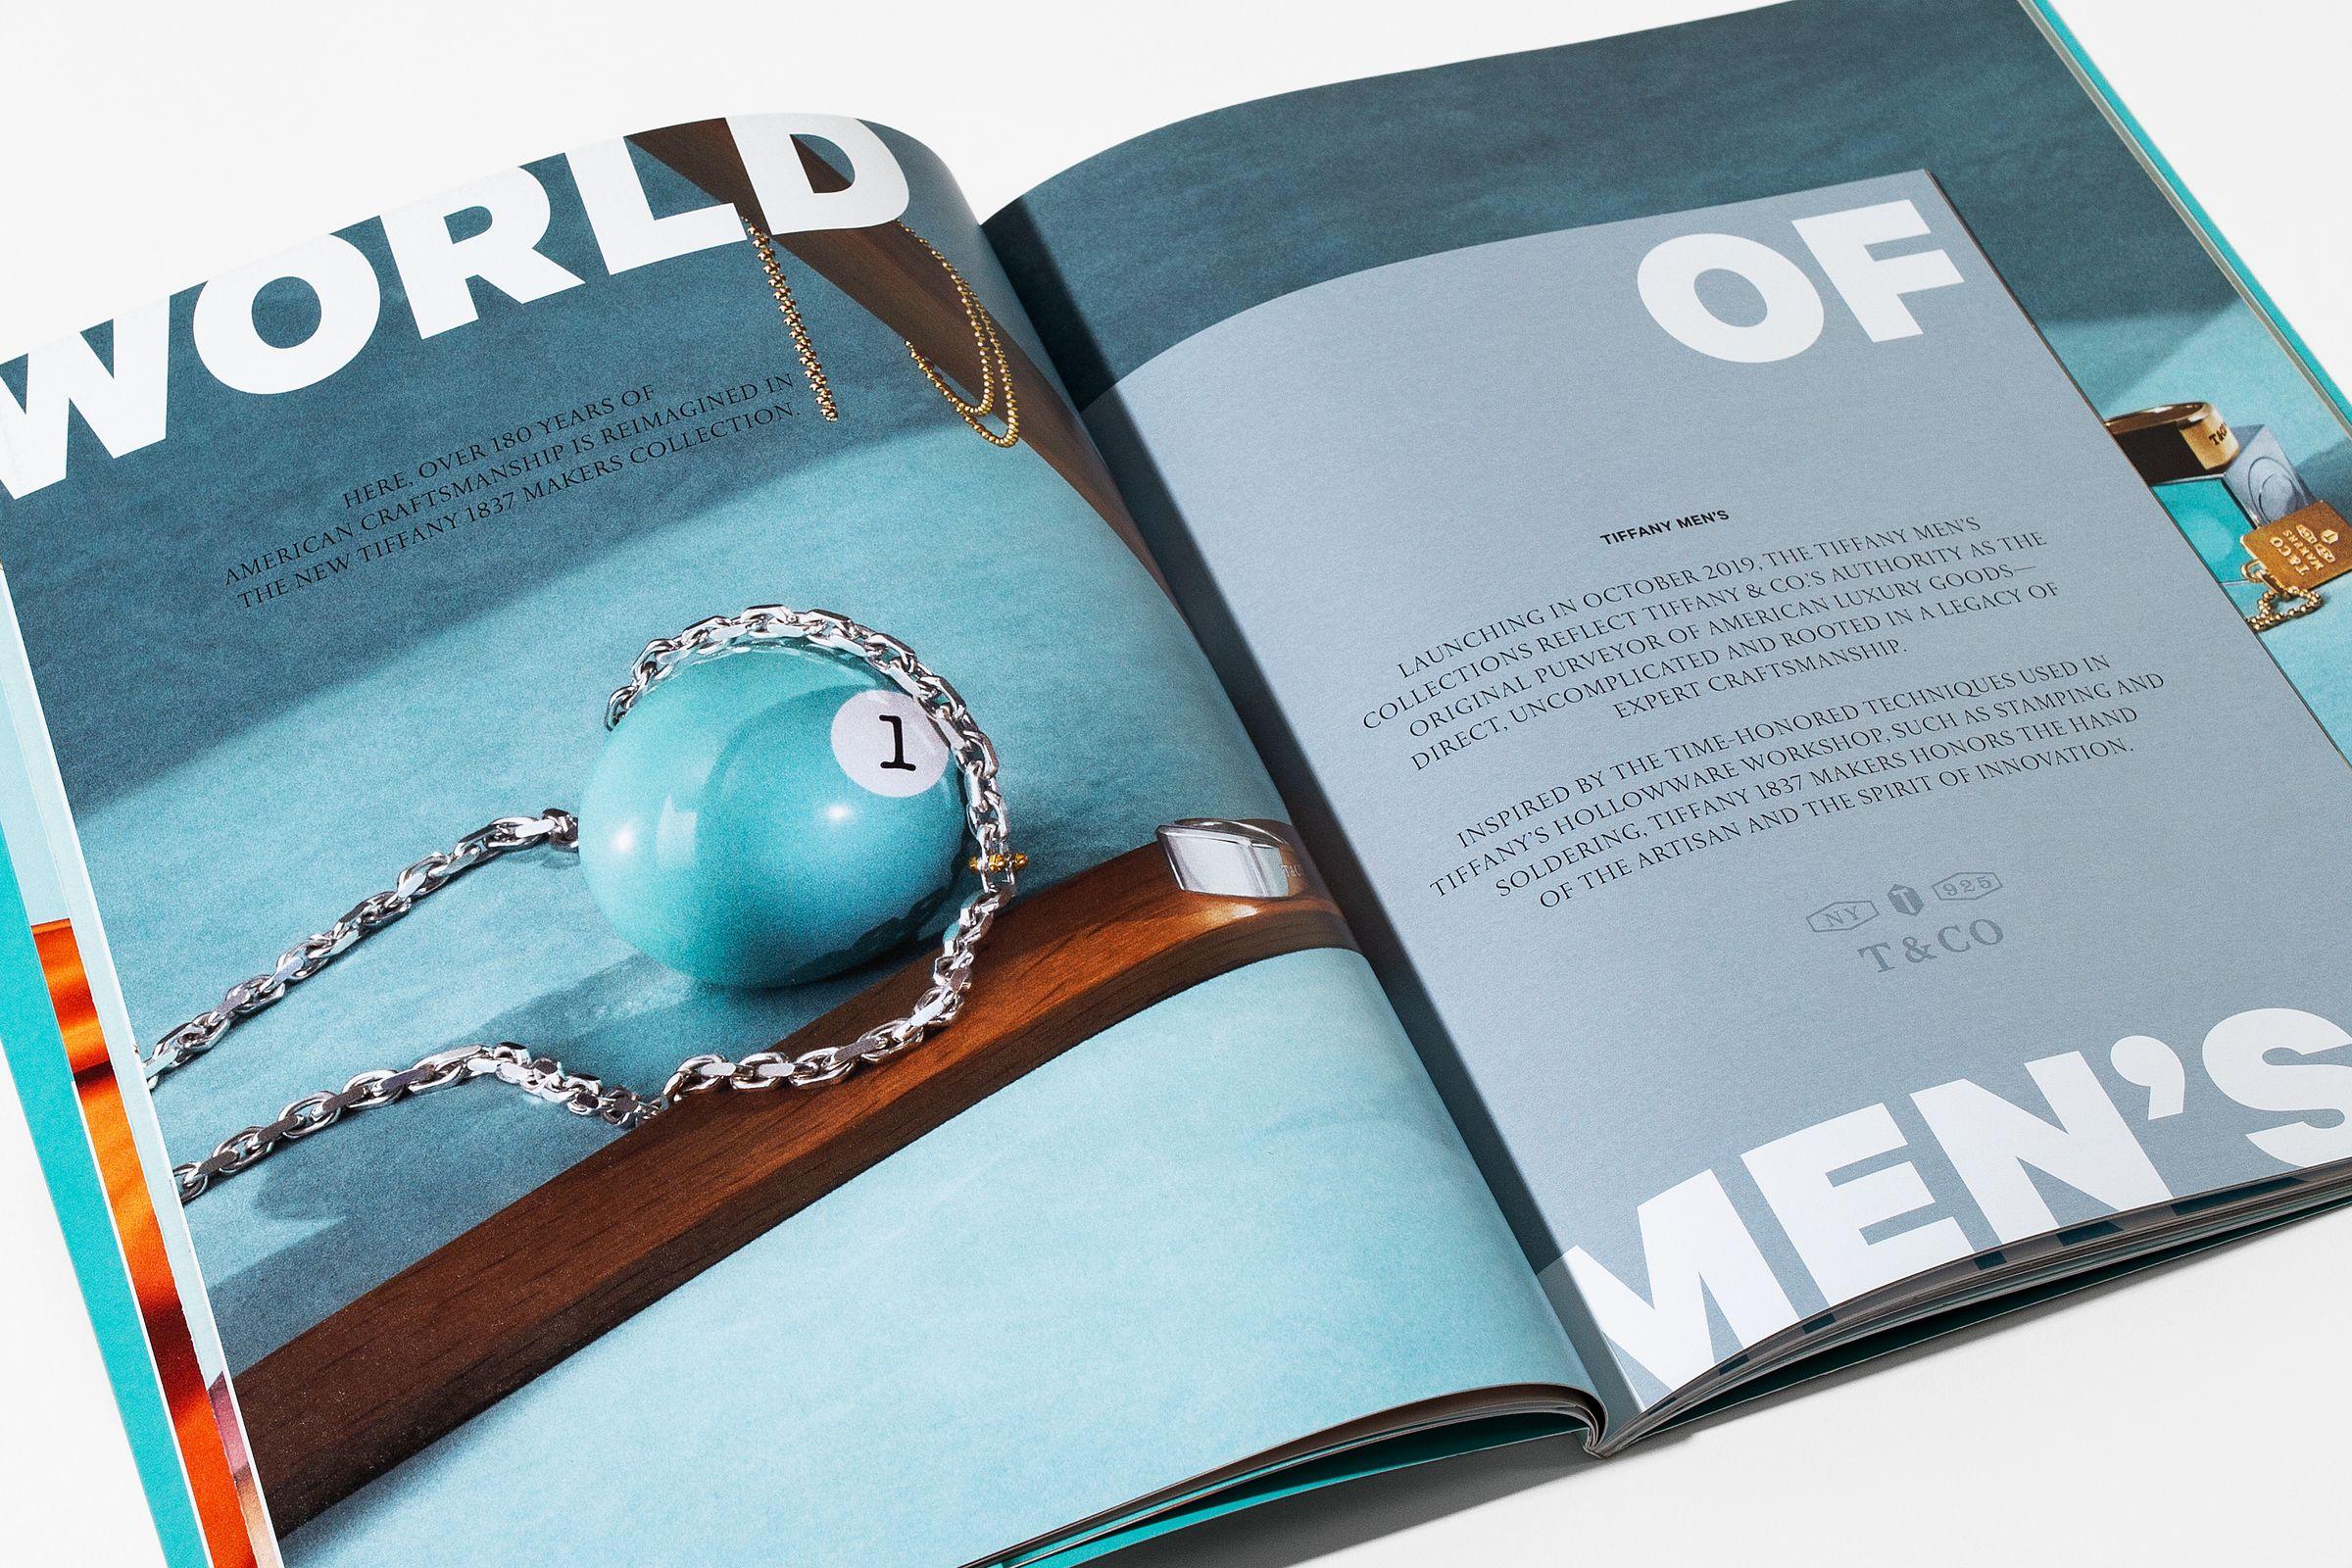 This is Tiffany magazine issue 9 spread design men's accessories